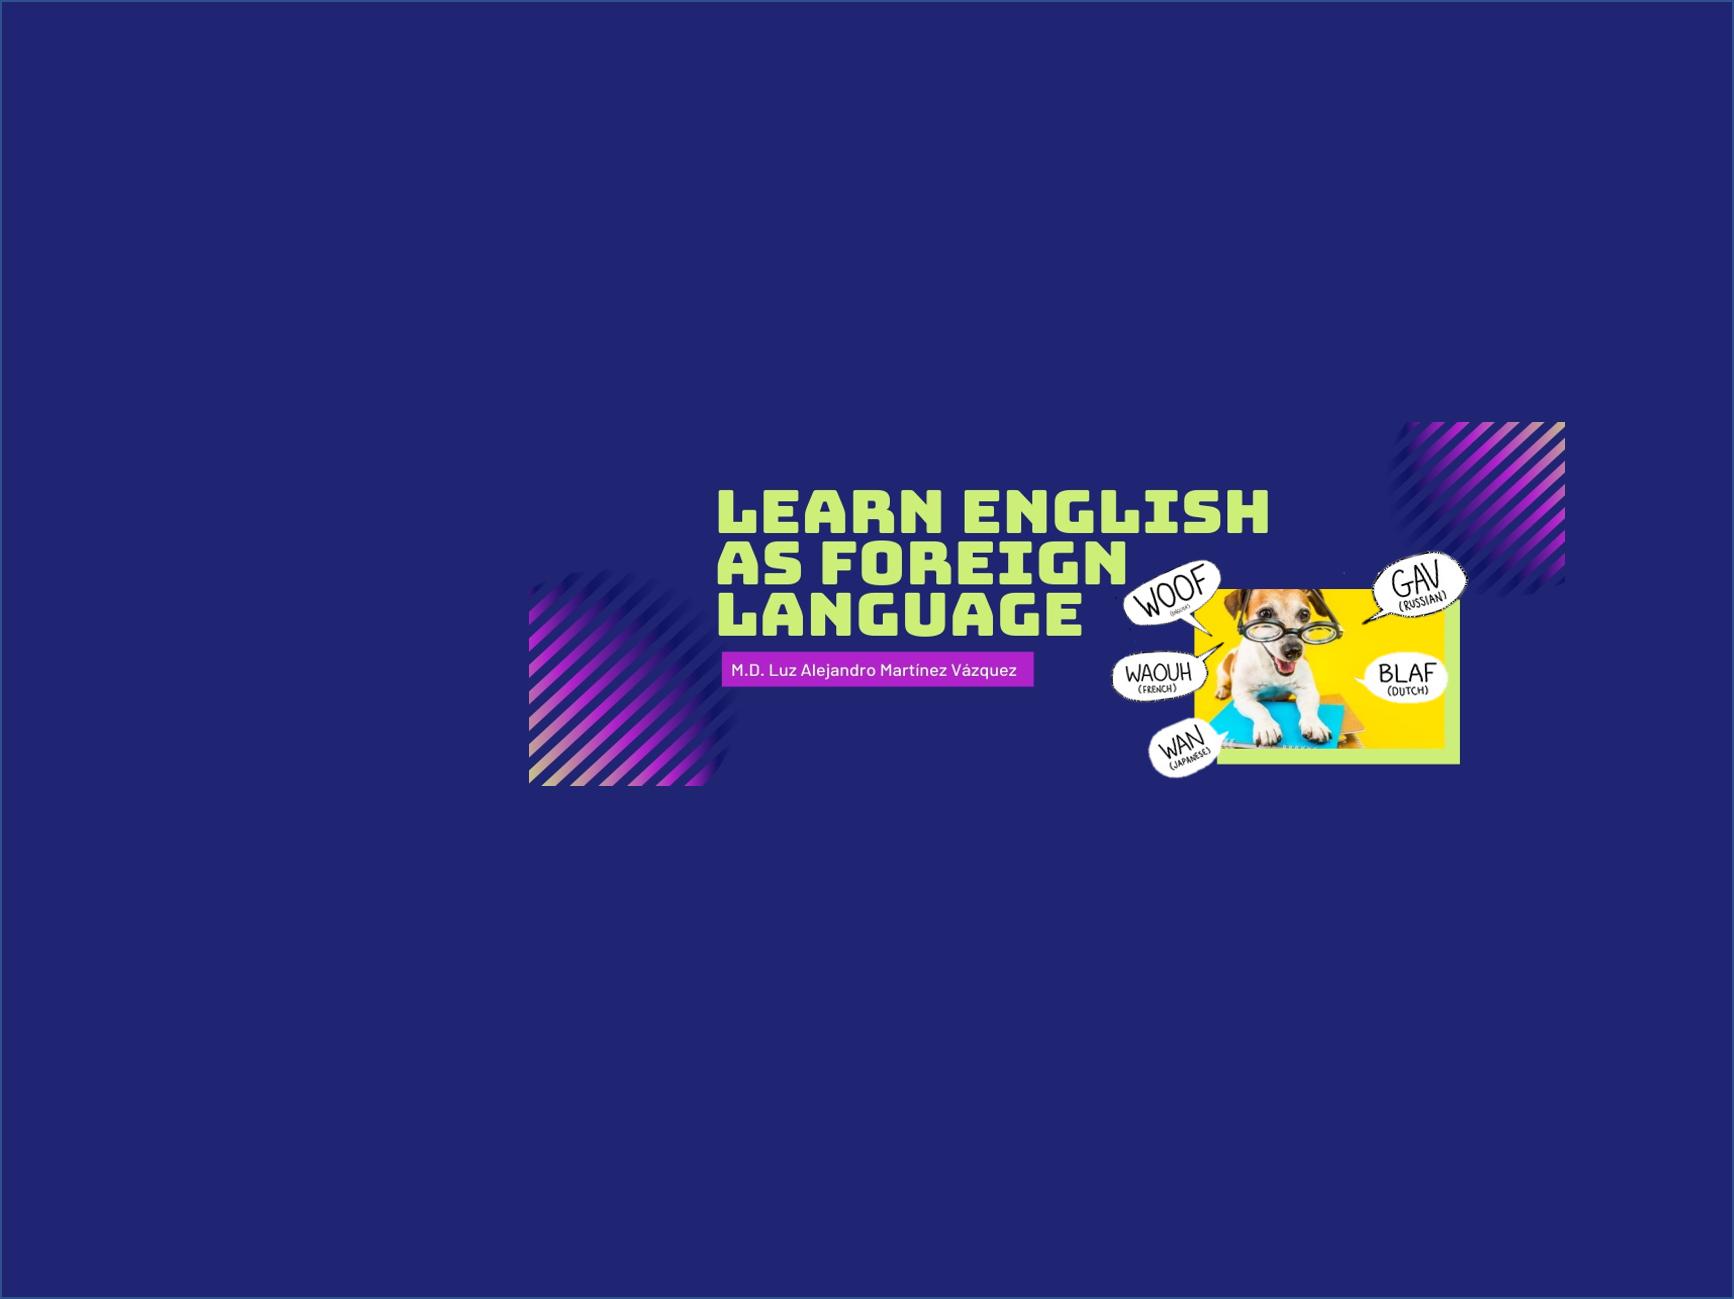 Aprender inglés como lengua extranjera